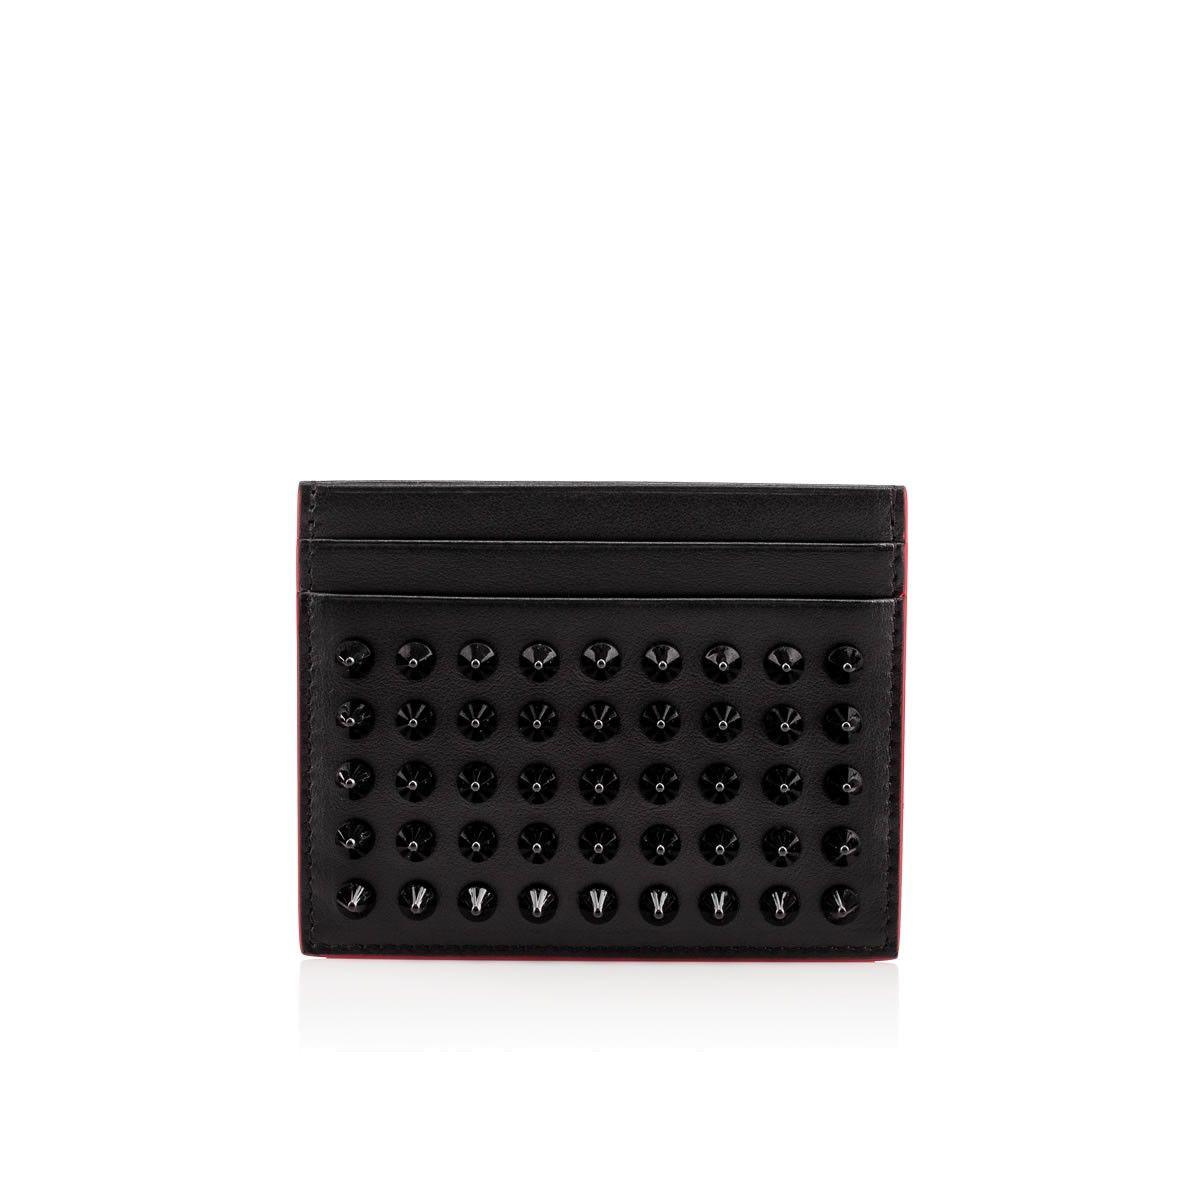 Christian Louboutin Kios Simple Card Holder Black Gunmetal Christianlouboutin Bags Leather Lining Acces Card Holder Leather Christian Louboutin Gunmetal